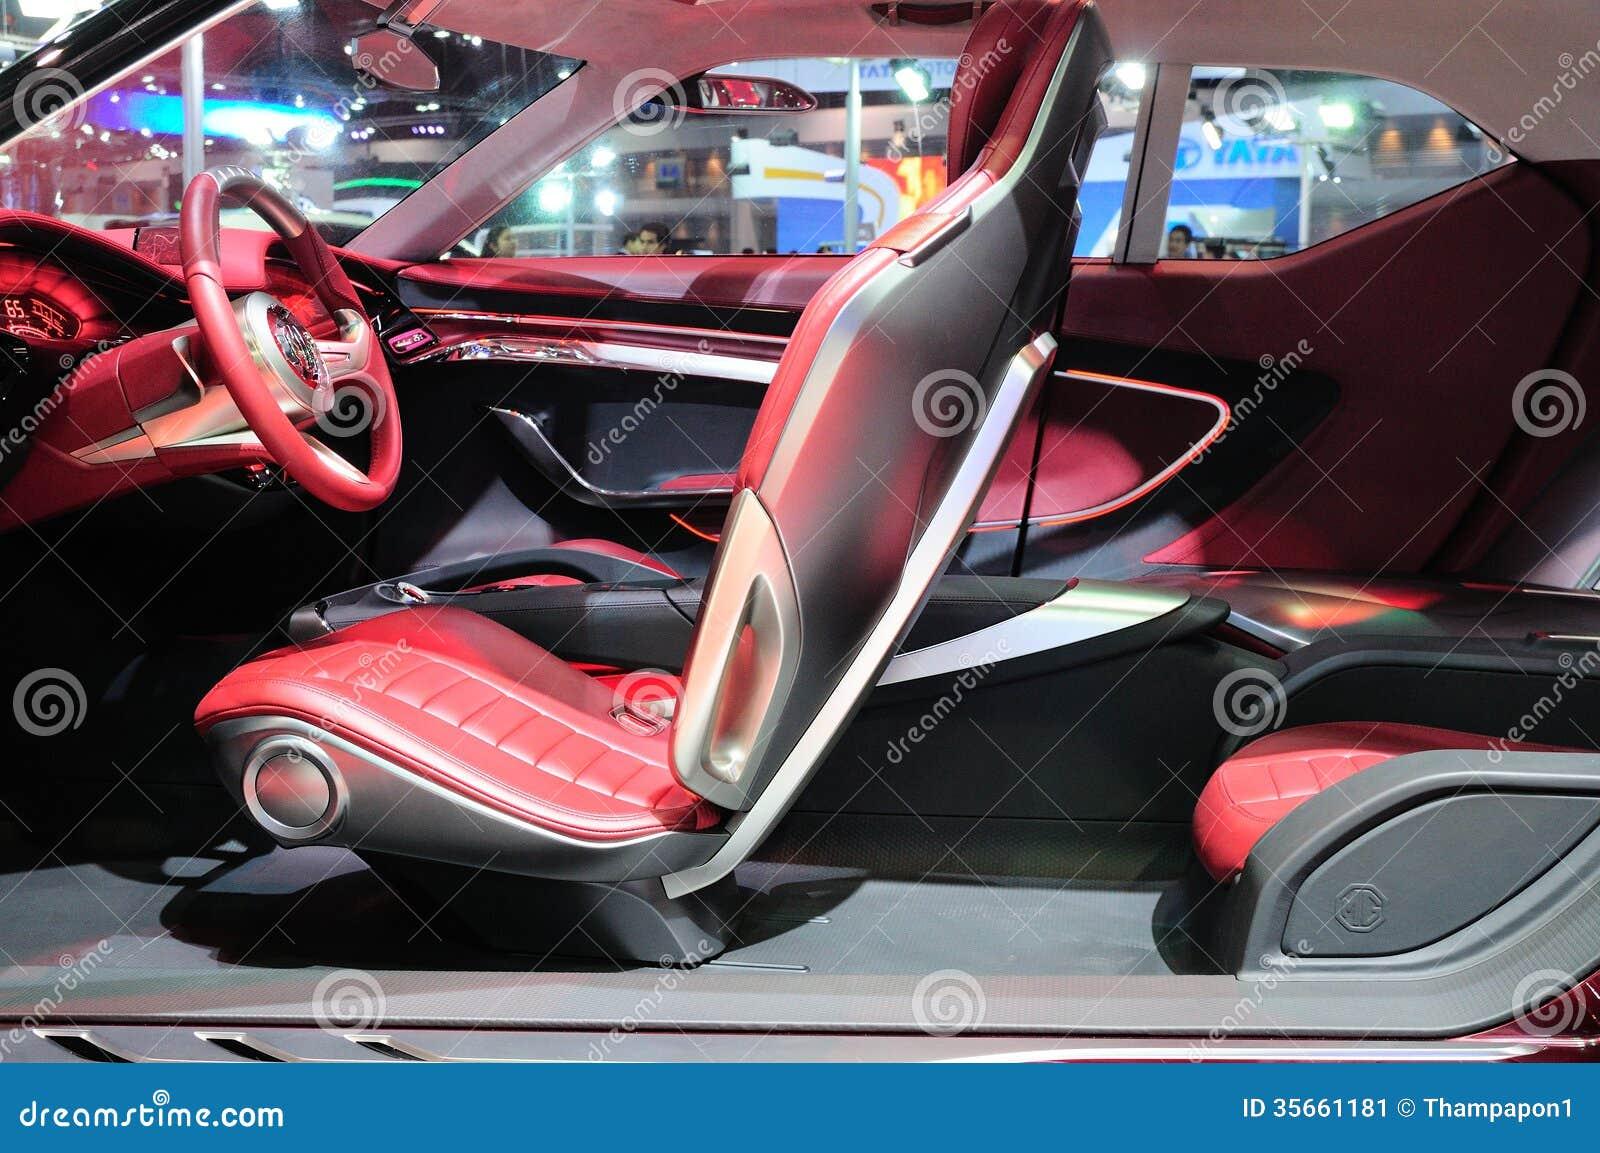 bkk nov 28 interior design of mg icon suv concept car on di editorial photo image 35661181. Black Bedroom Furniture Sets. Home Design Ideas